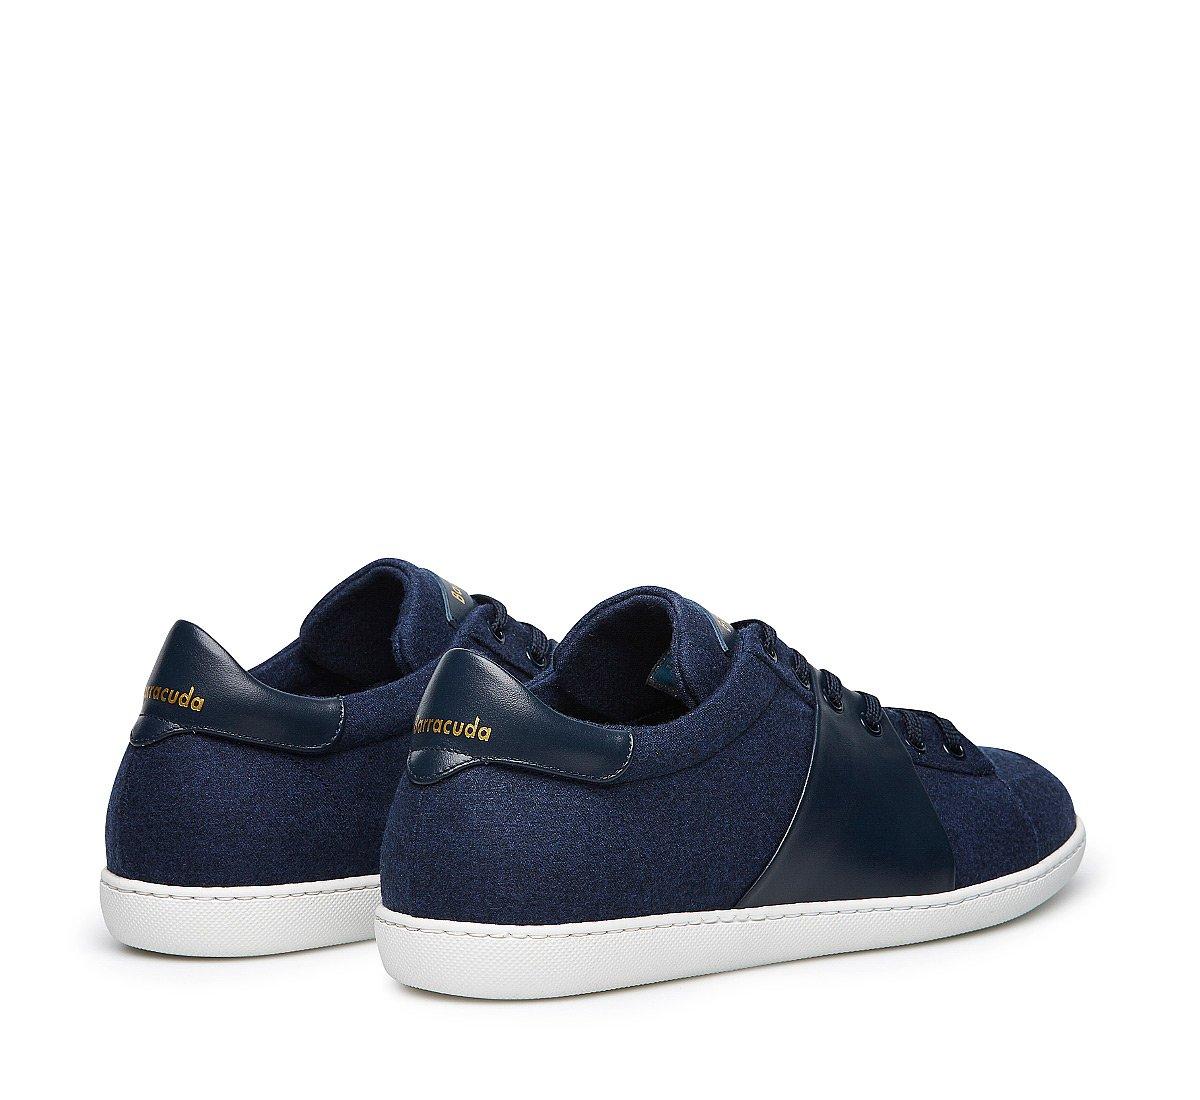 Flannel sneakers